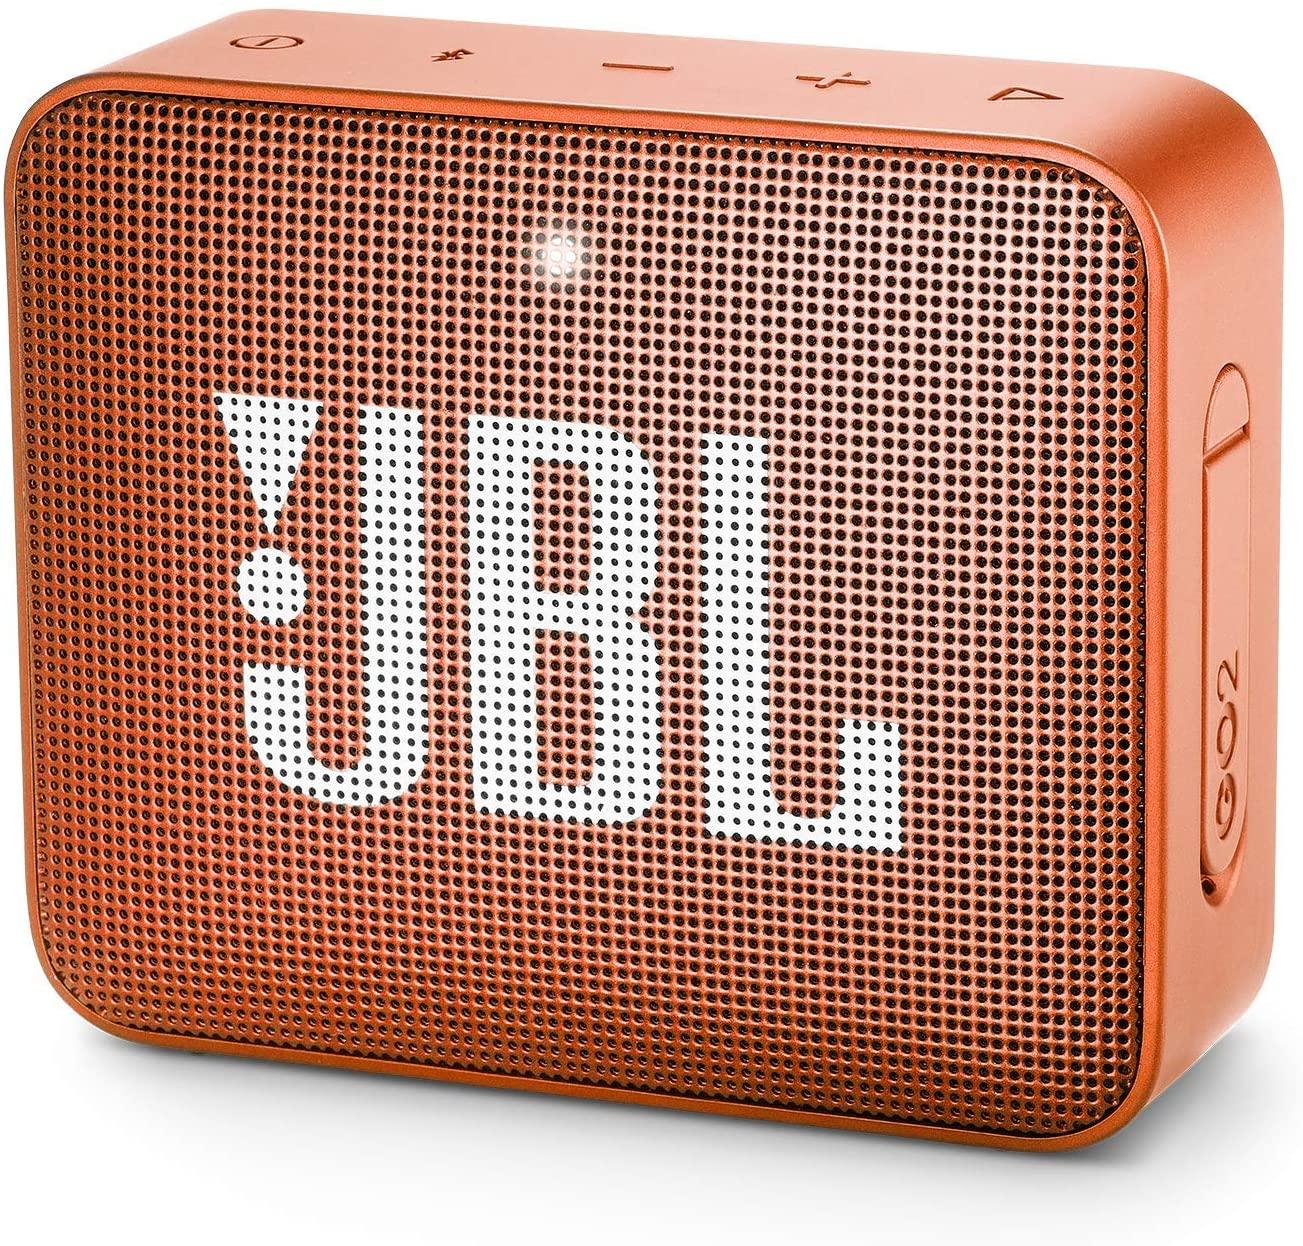 Bocina inalámbrica JBL GO 2 resistente al agua - Naranja